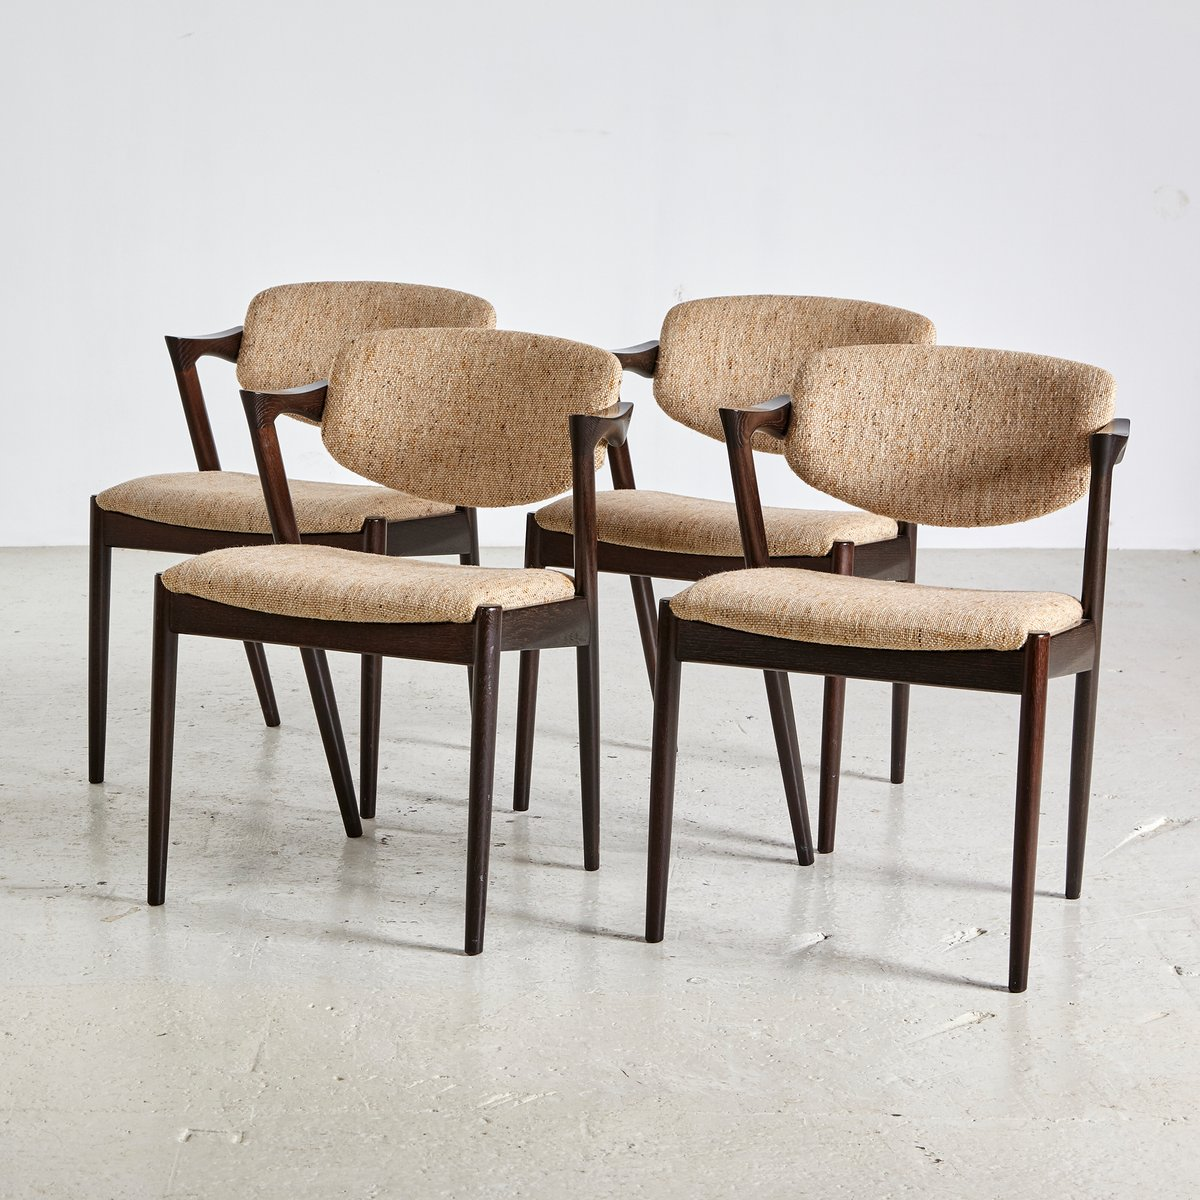 Mid century modell 42 stuhl von kai kristiansen f r schou andersen 1960er bei pamono kaufen - Mid century stuhl ...